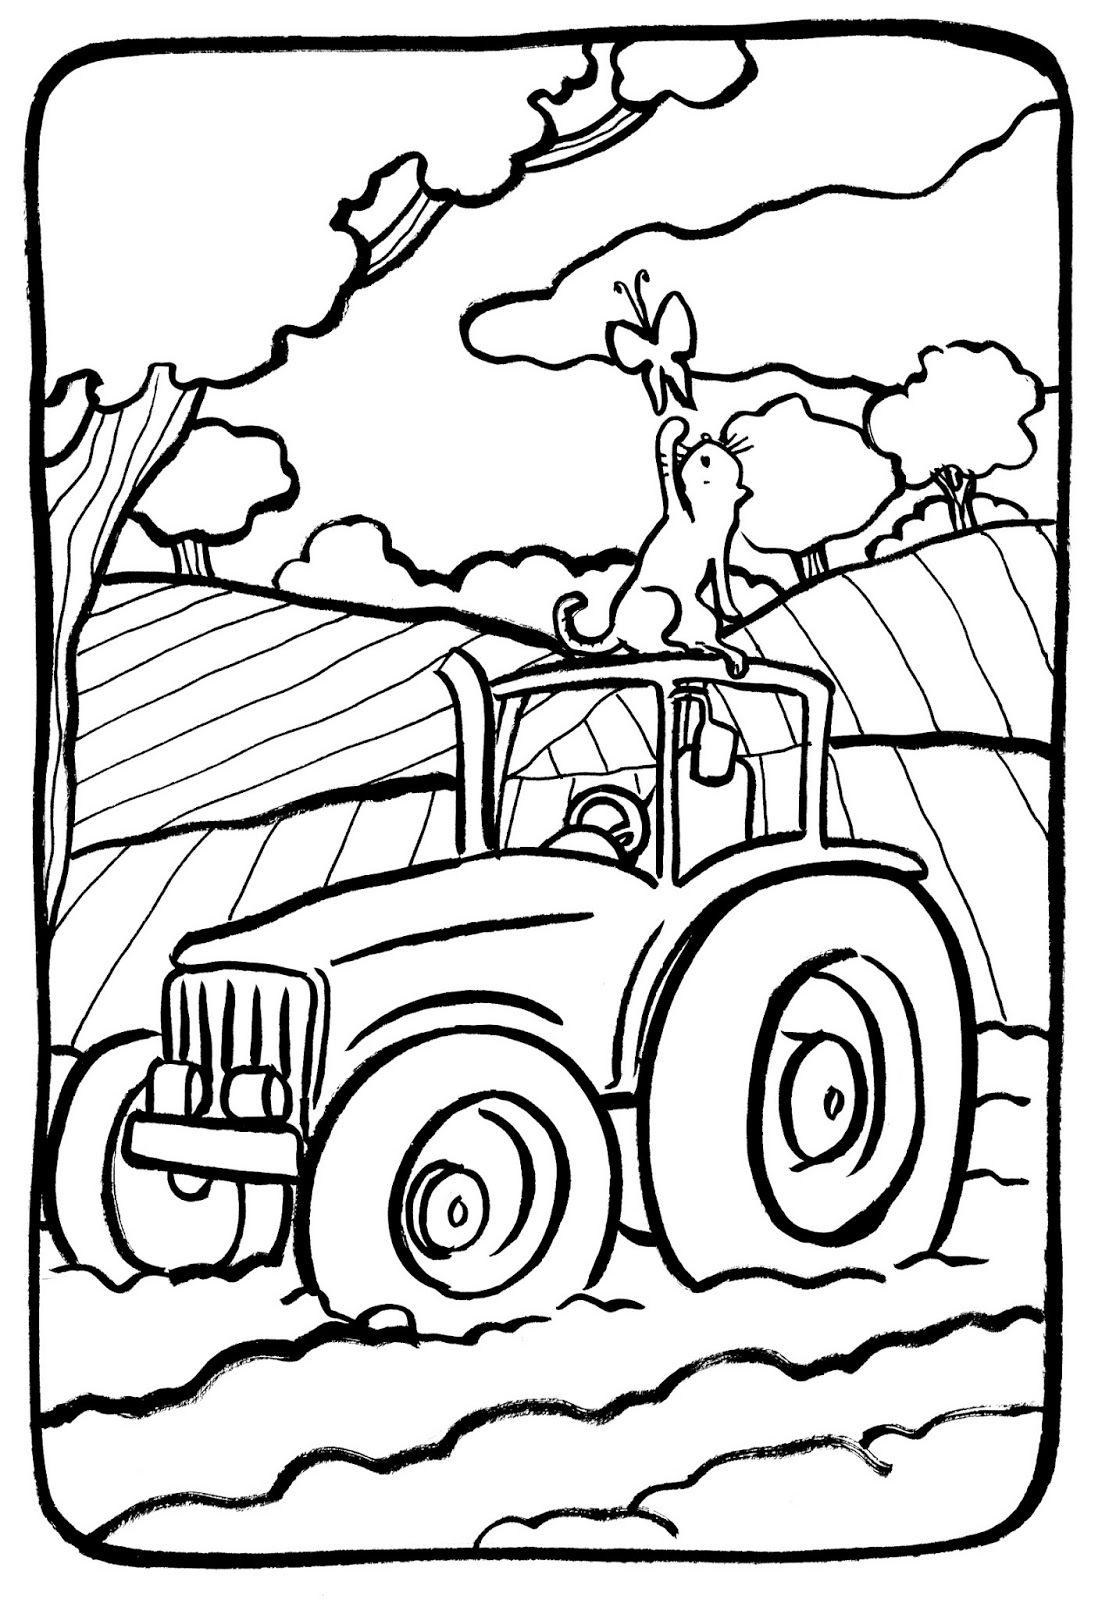 Coloriage A Imprimer De Tracteur Avec Remorque